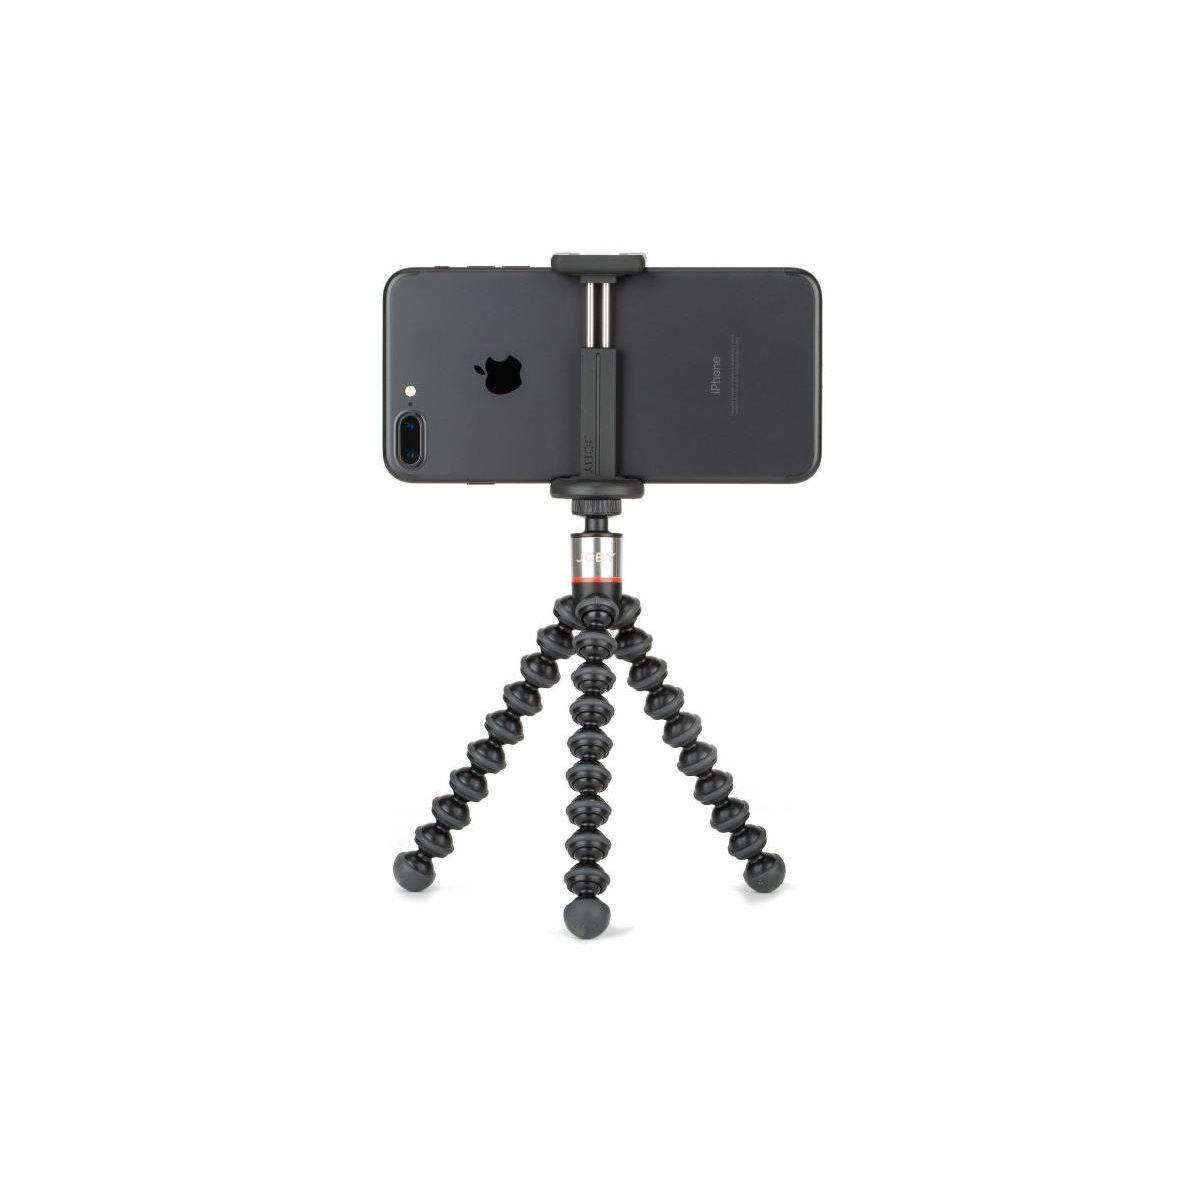 Support smartphone joby griptight one stand noir - livraison offerte : code liv (photo)